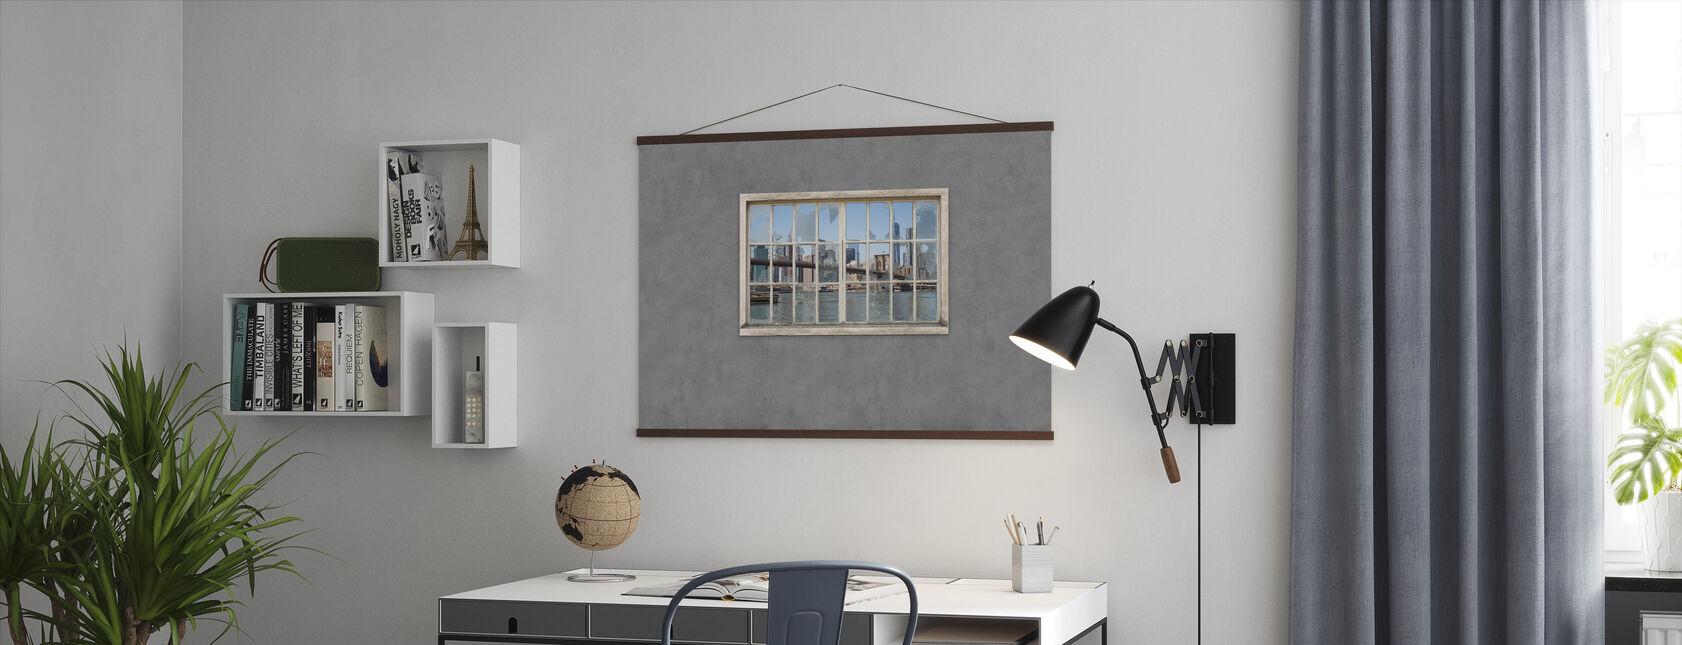 View from Basement Windows - Brooklyn Bridge - Poster - Office